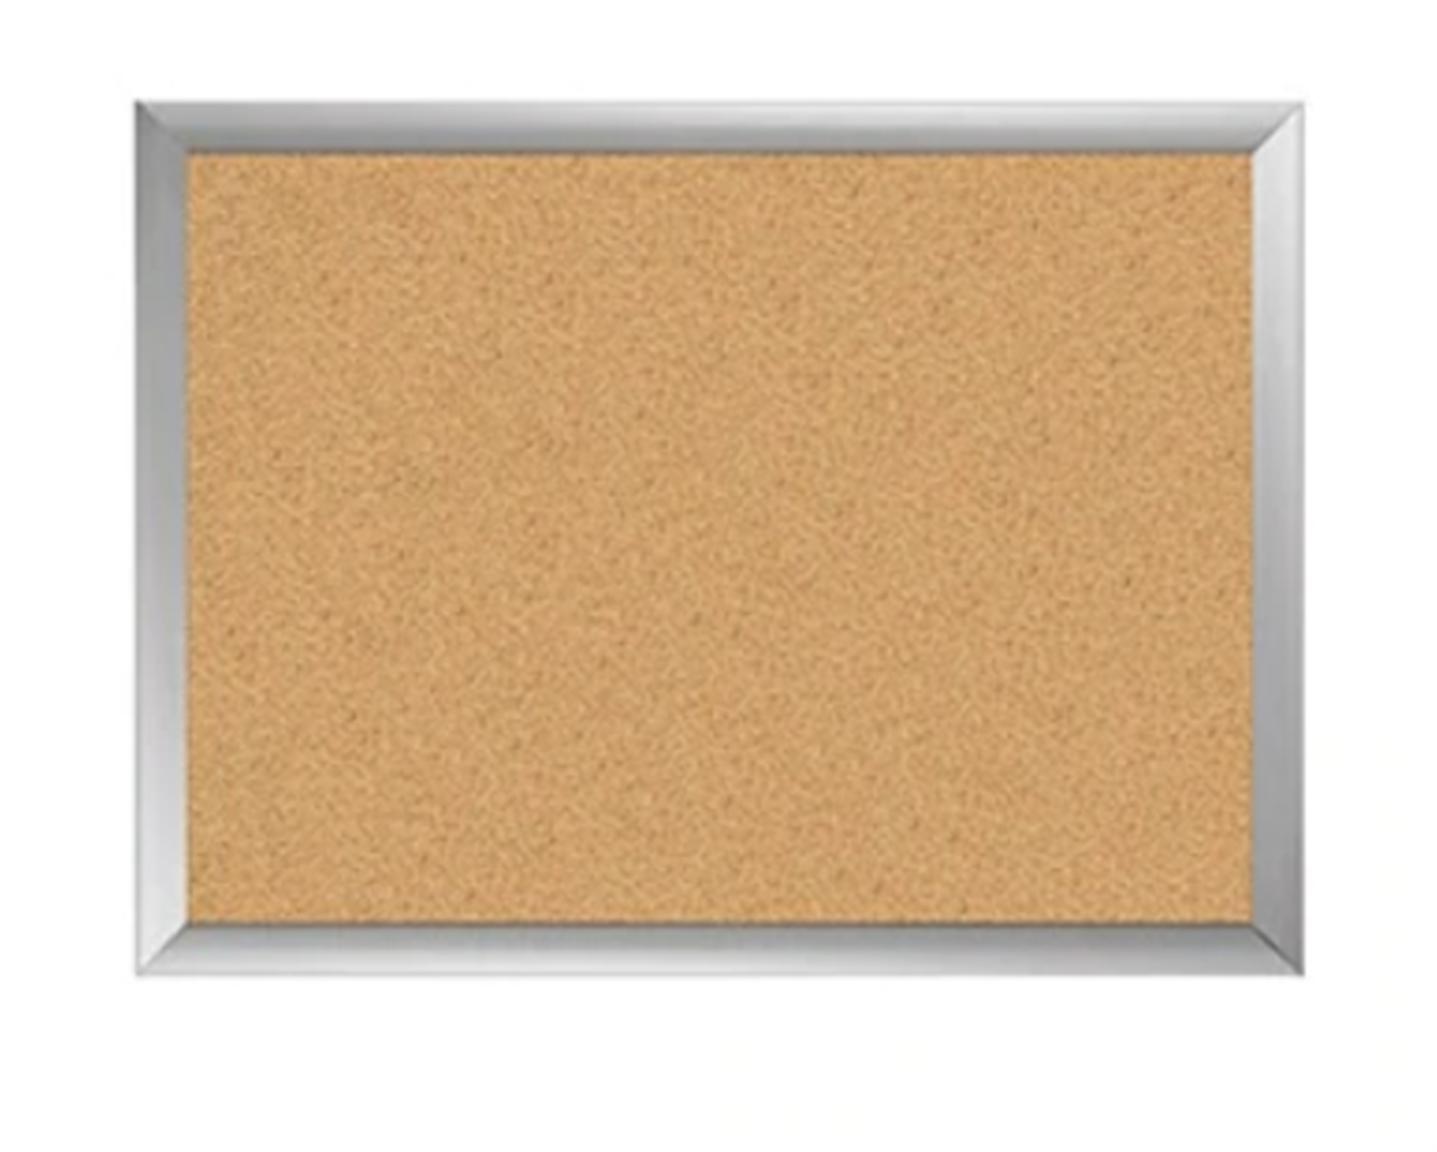 "Office Depot – Cork Board 24"" x 36"" Silver Frame Only $12.99, Reg $48.29!"